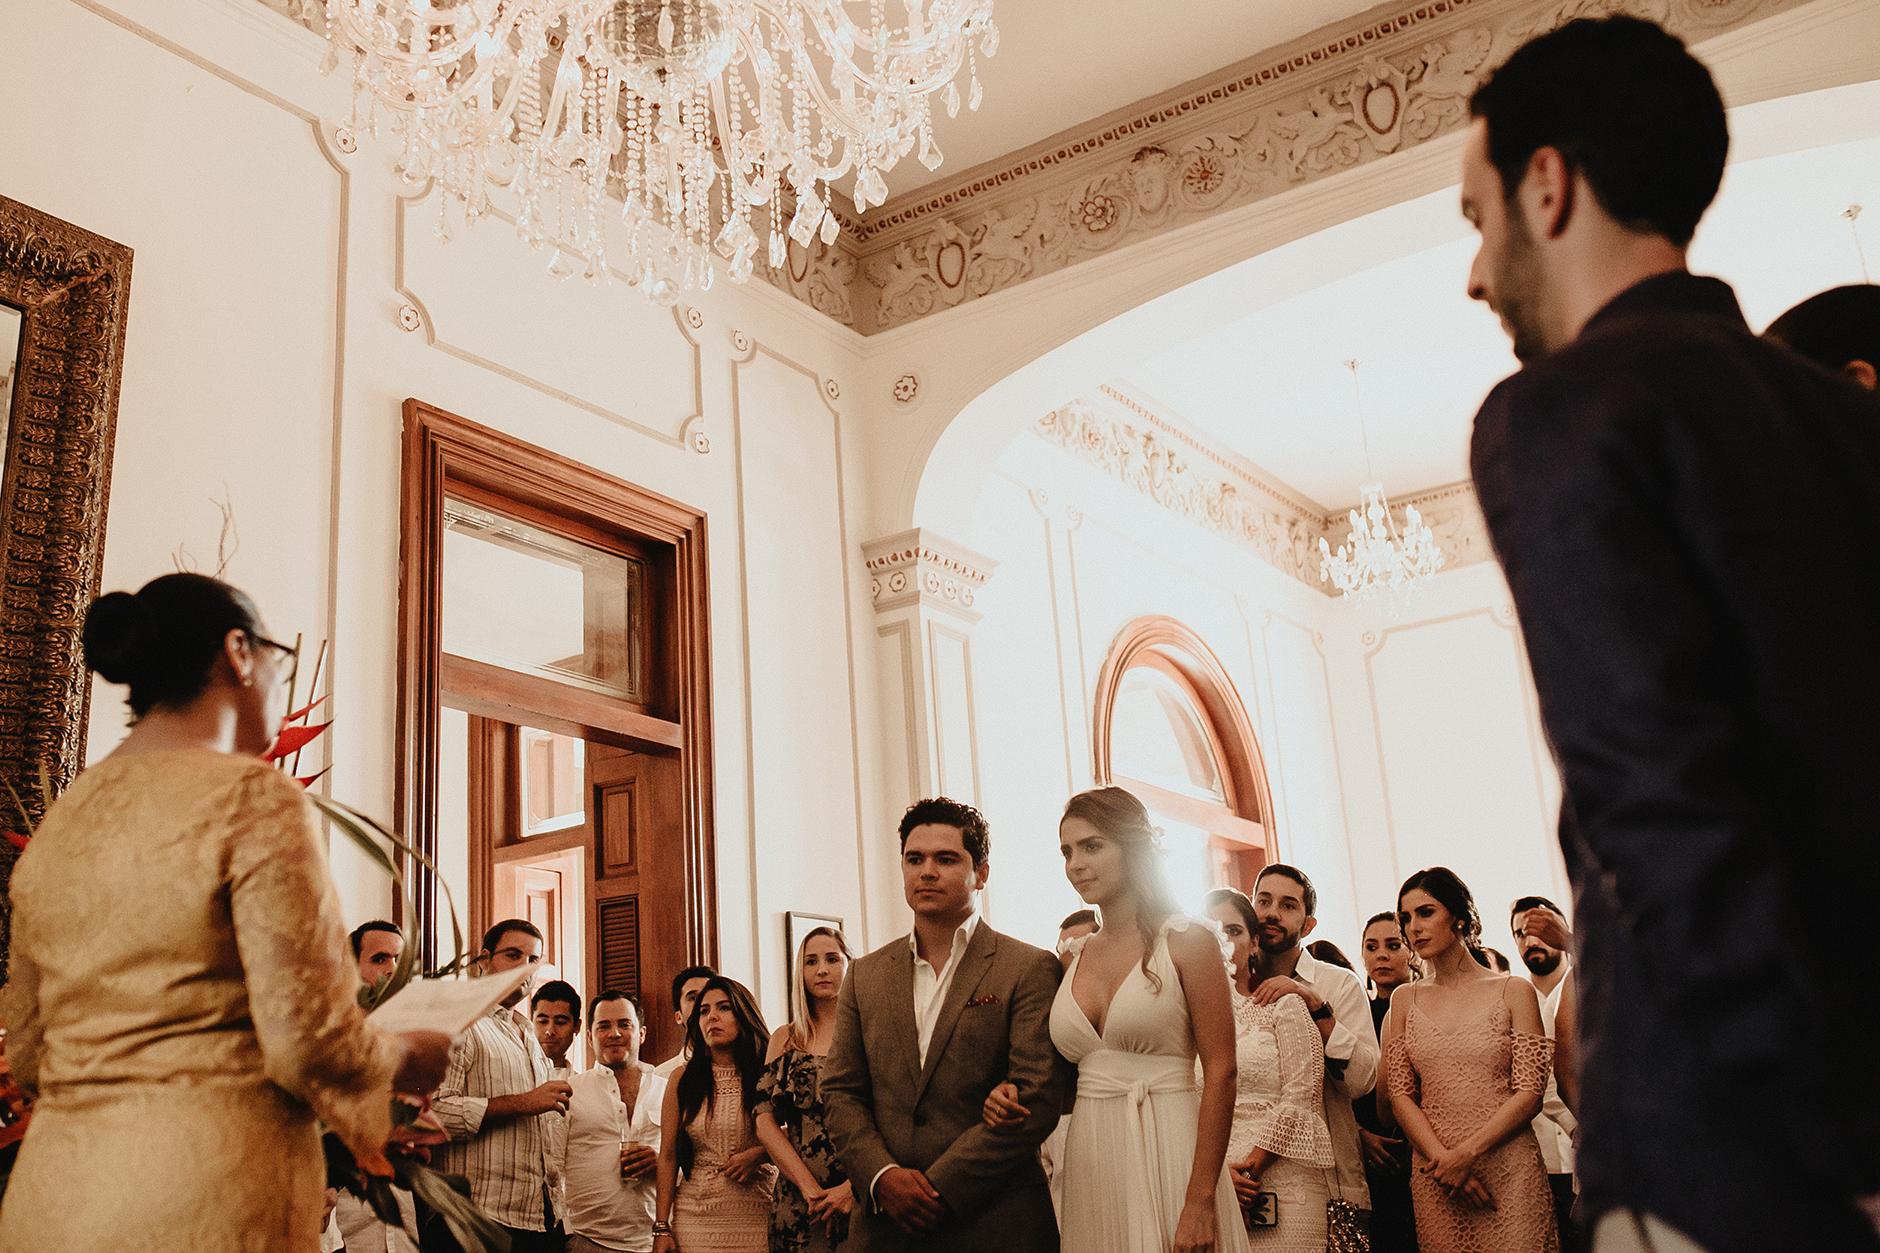 0093civil_Hacienda_WeddingDstination_MeridaYucatan_HaciendasMerida_BodasMexico_BodasYucatan_Boda_Destino.jpg